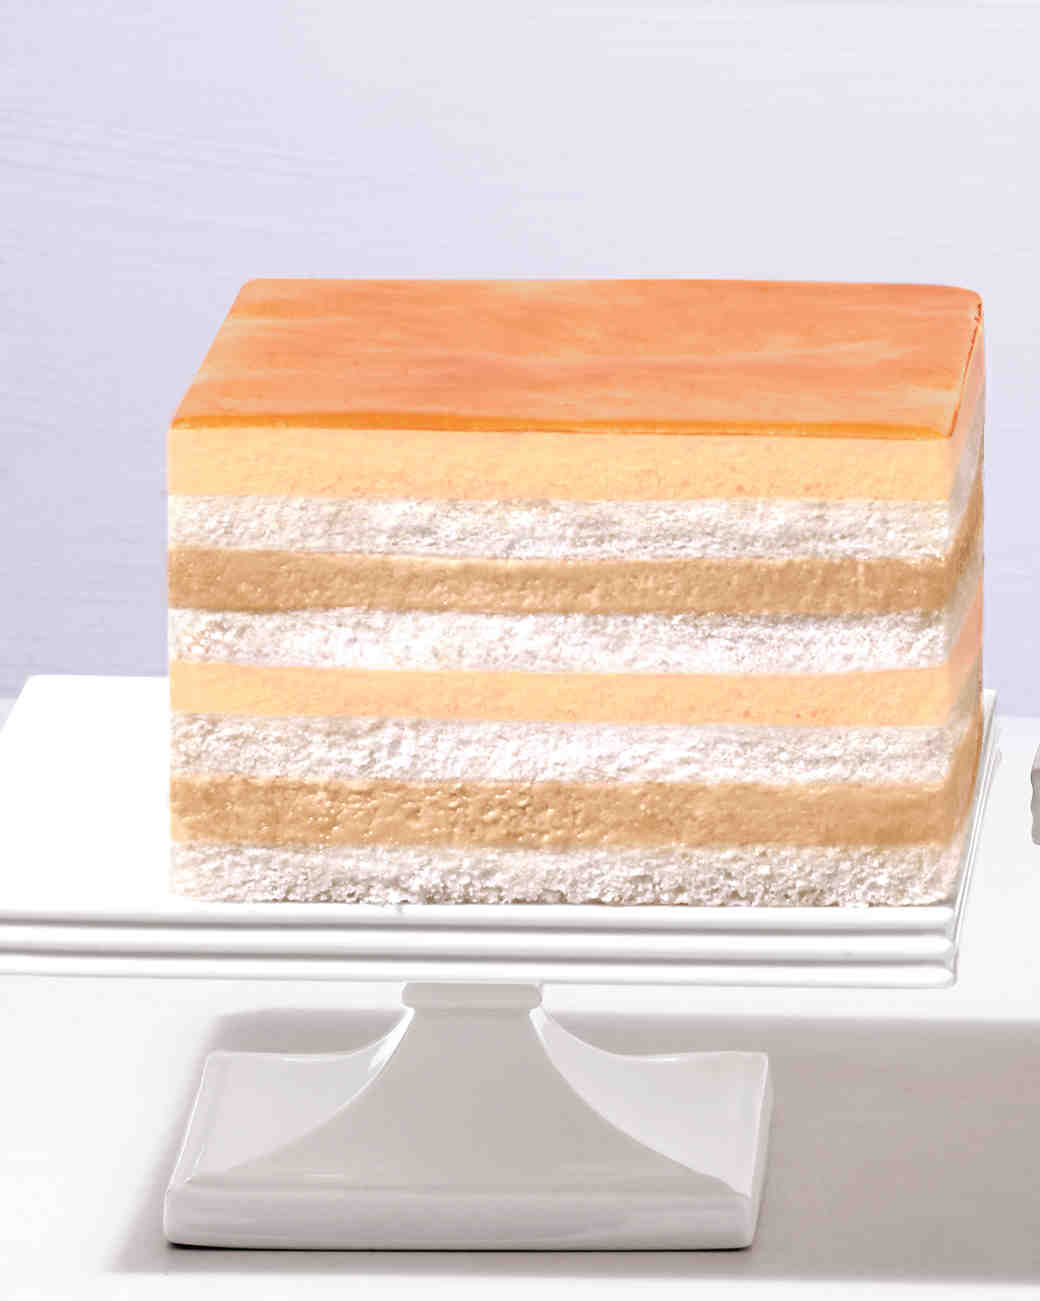 mpb-j-cake-1-d111409-1014.jpg